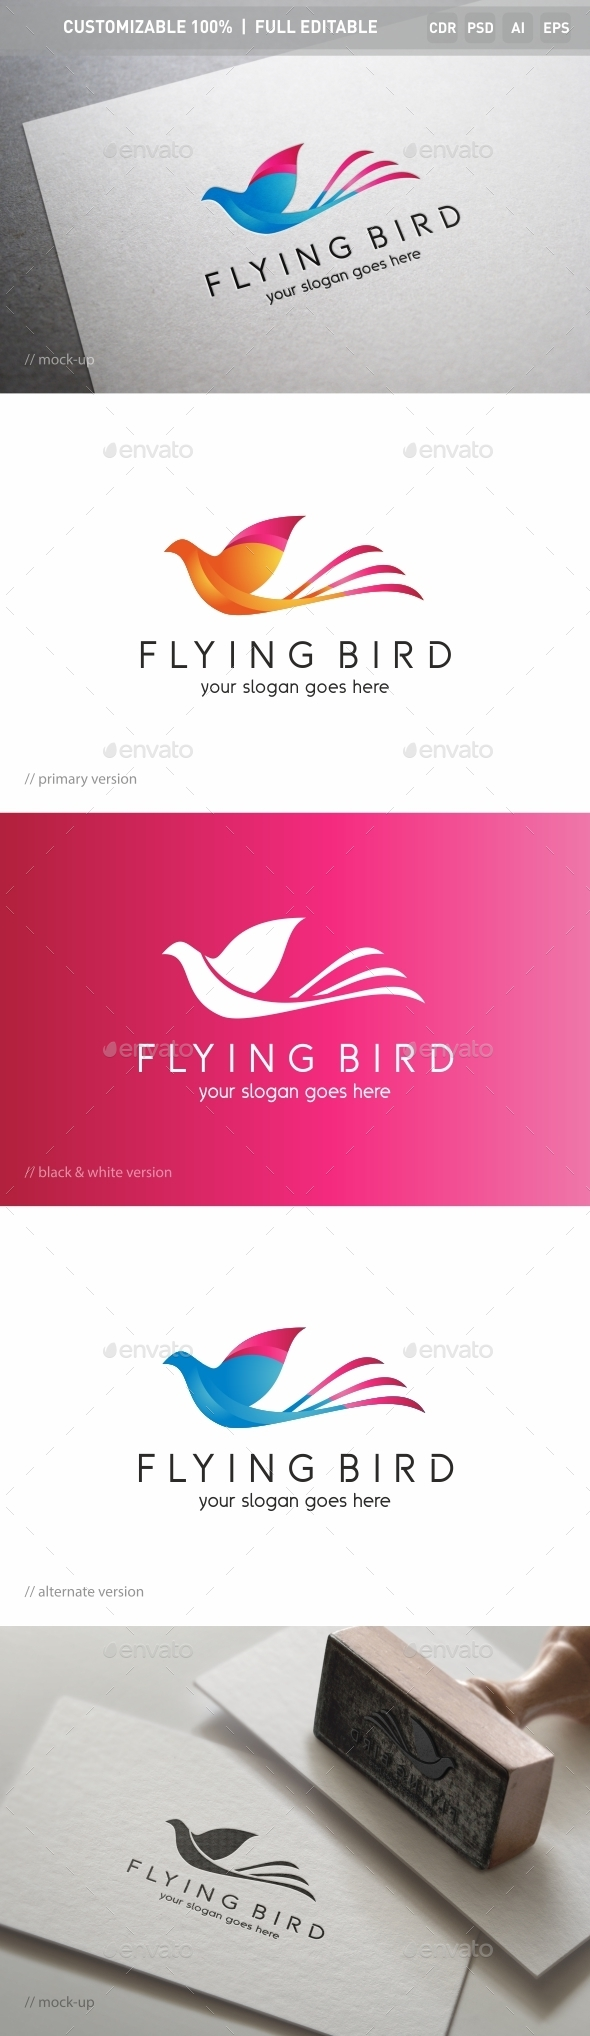 Flying Bird Logo Template - Objects Logo Templates